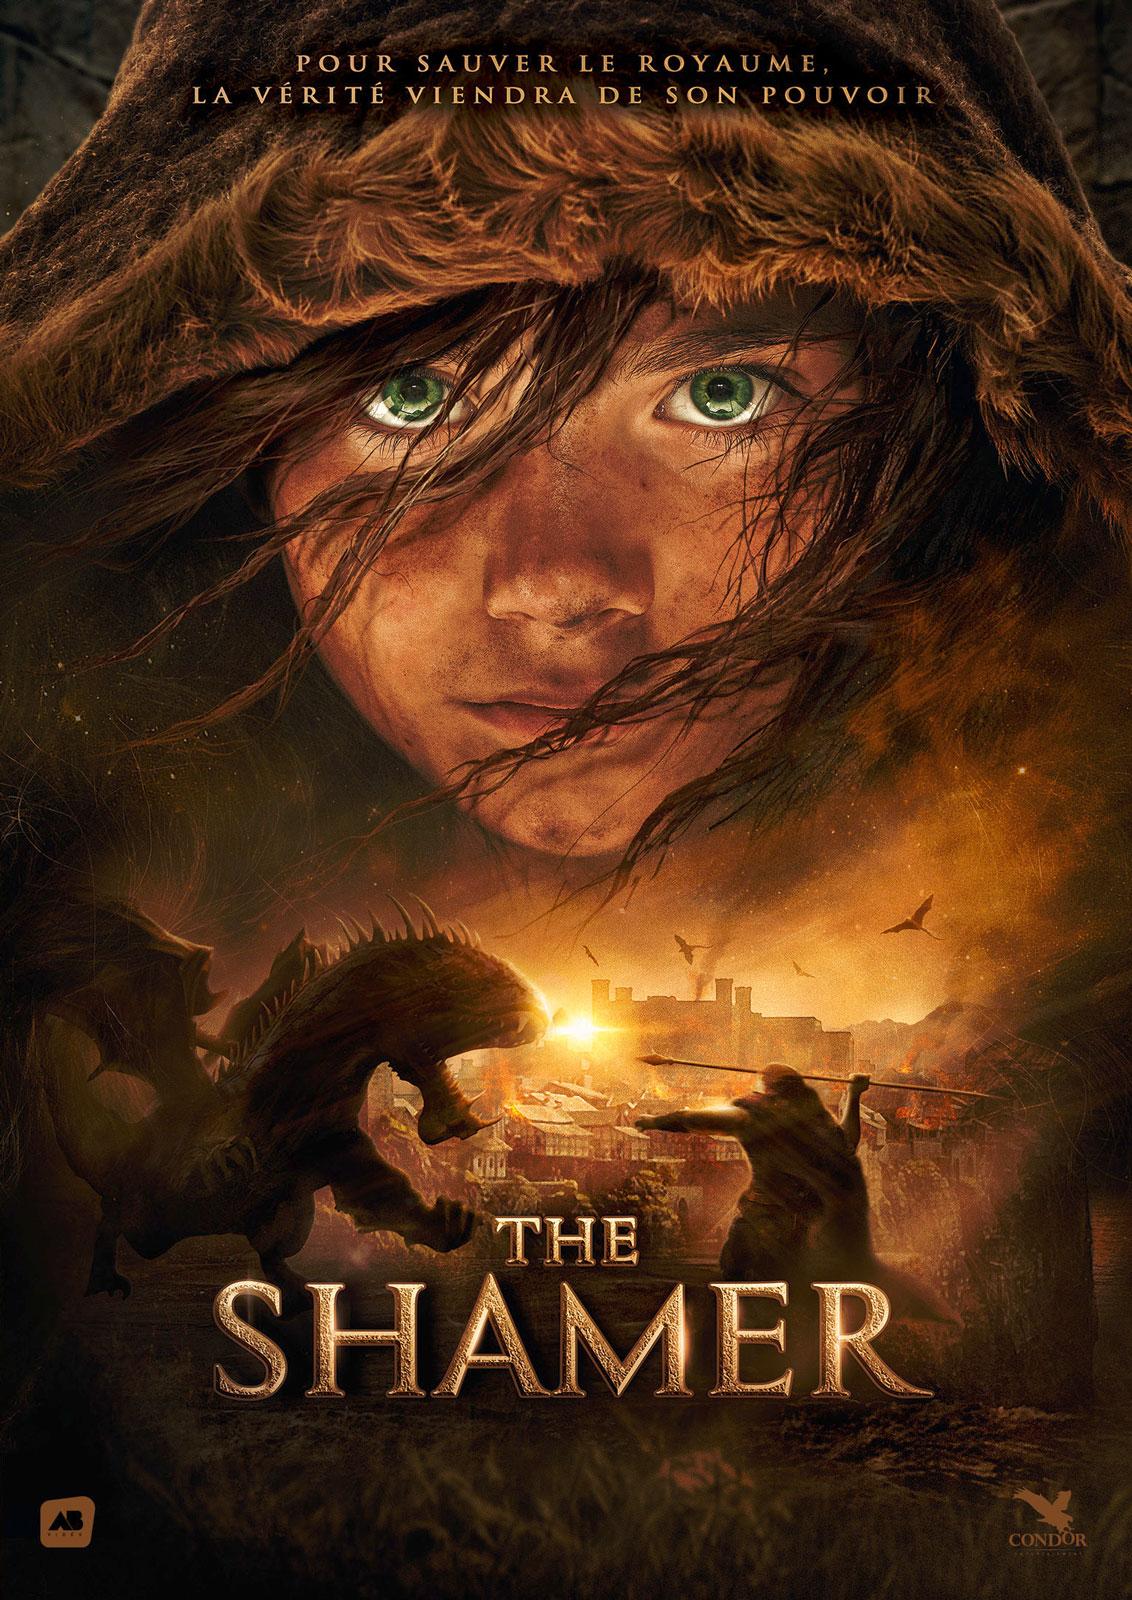 The Shamer ddl